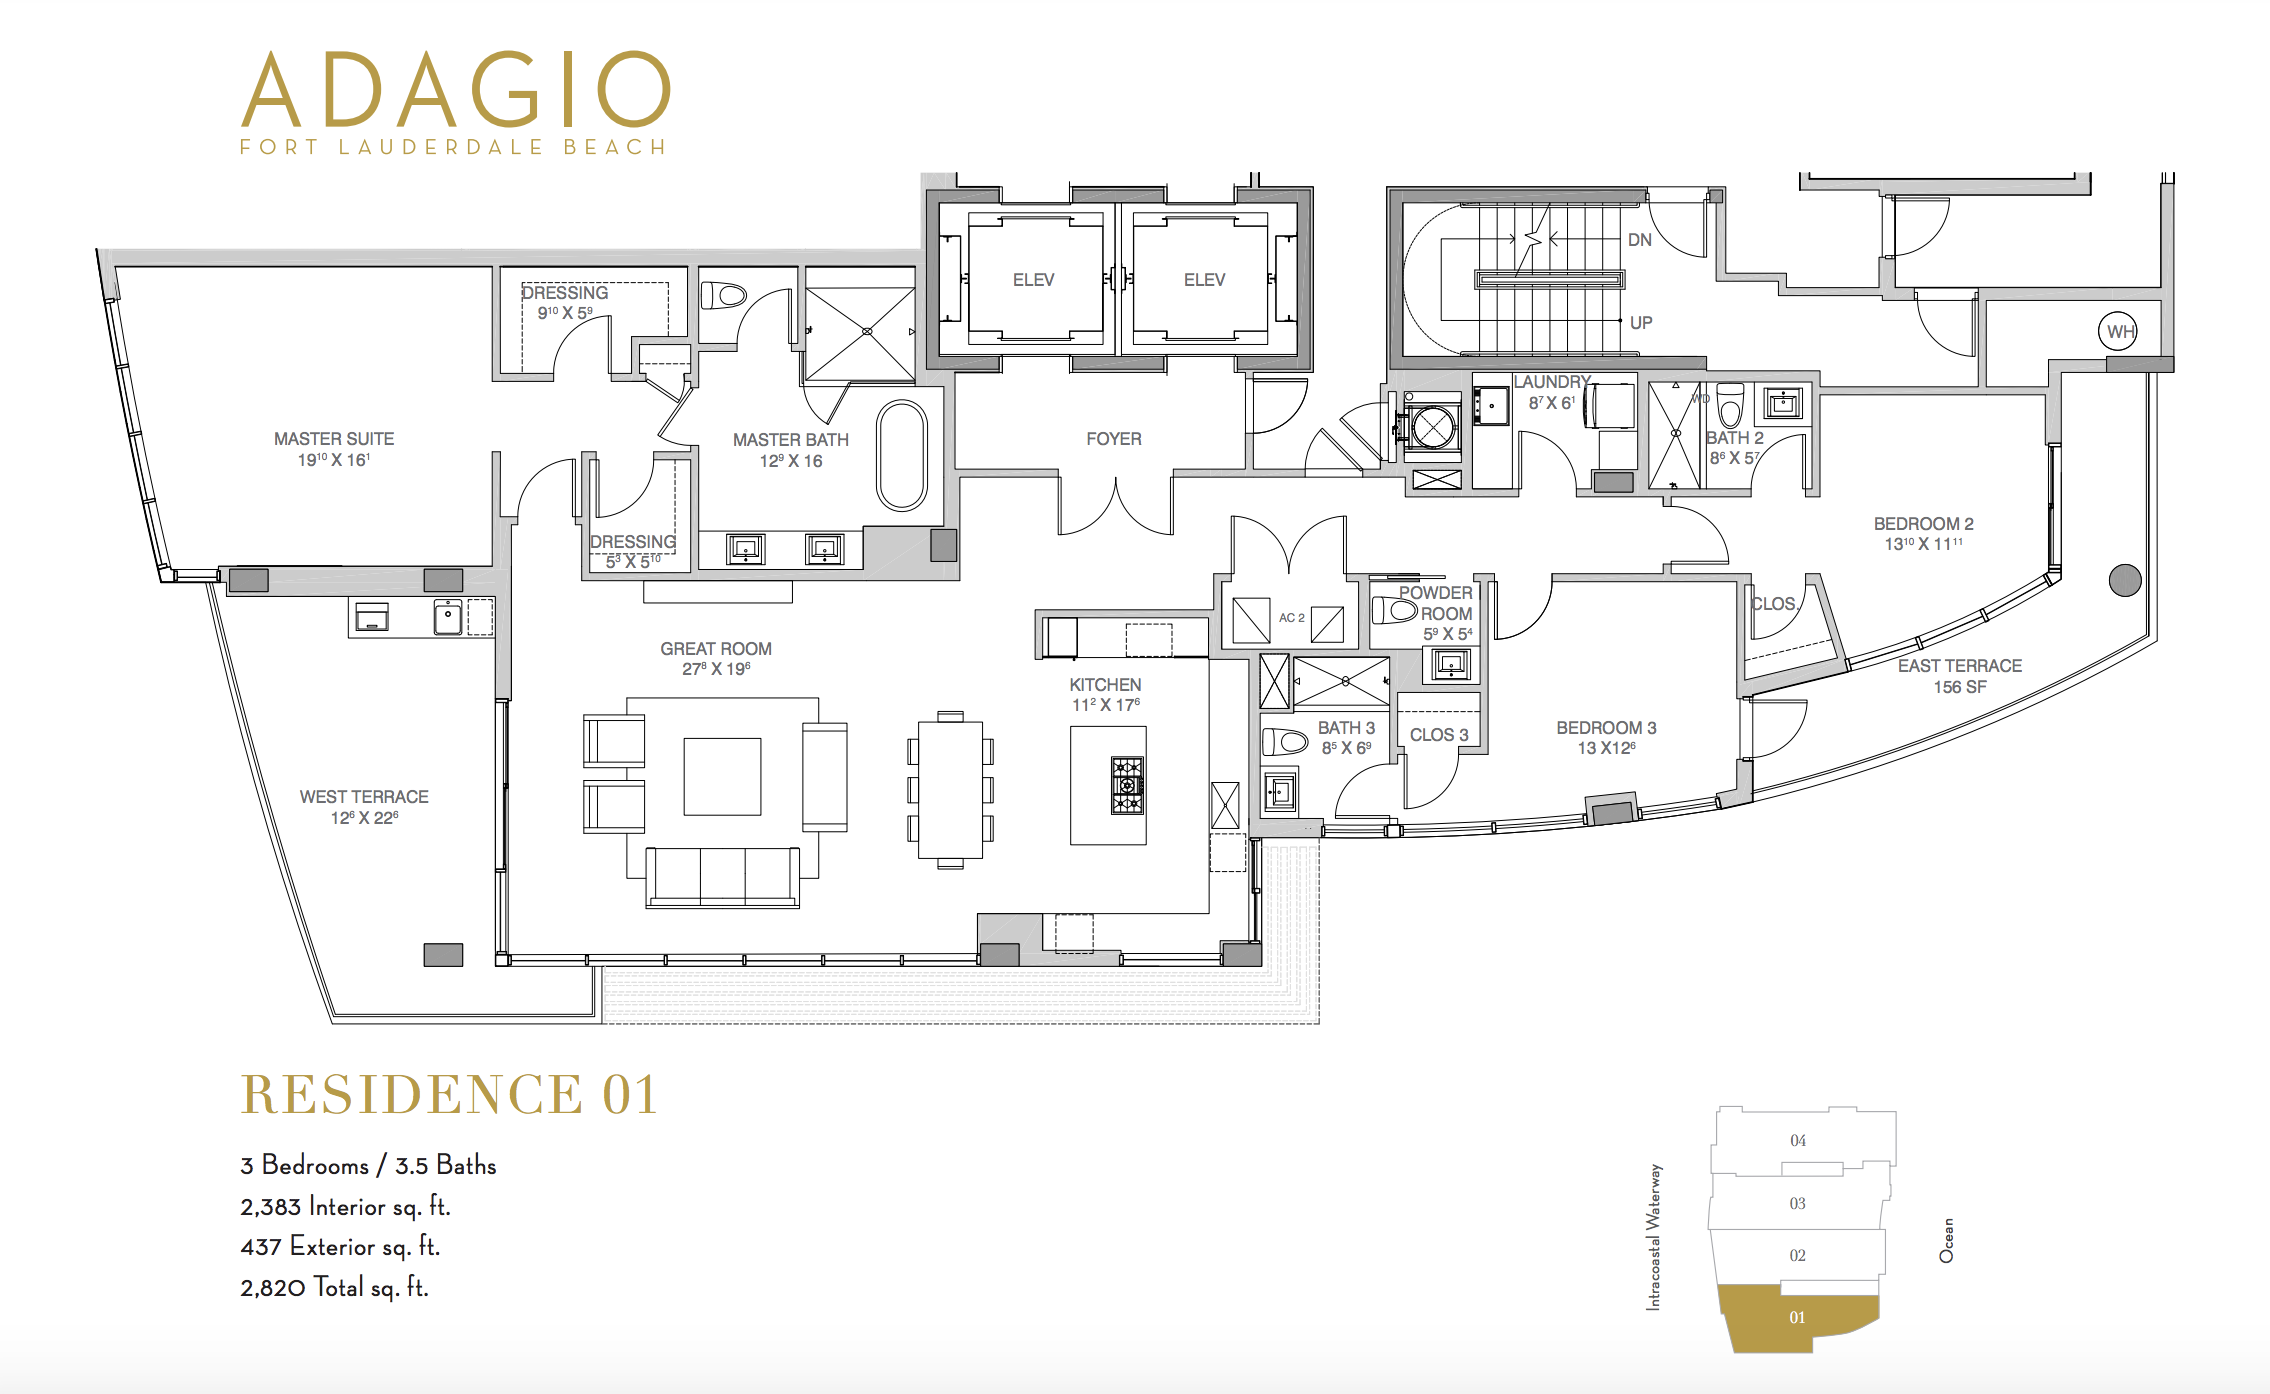 Adagio Fort Lauderdale   Residence 01